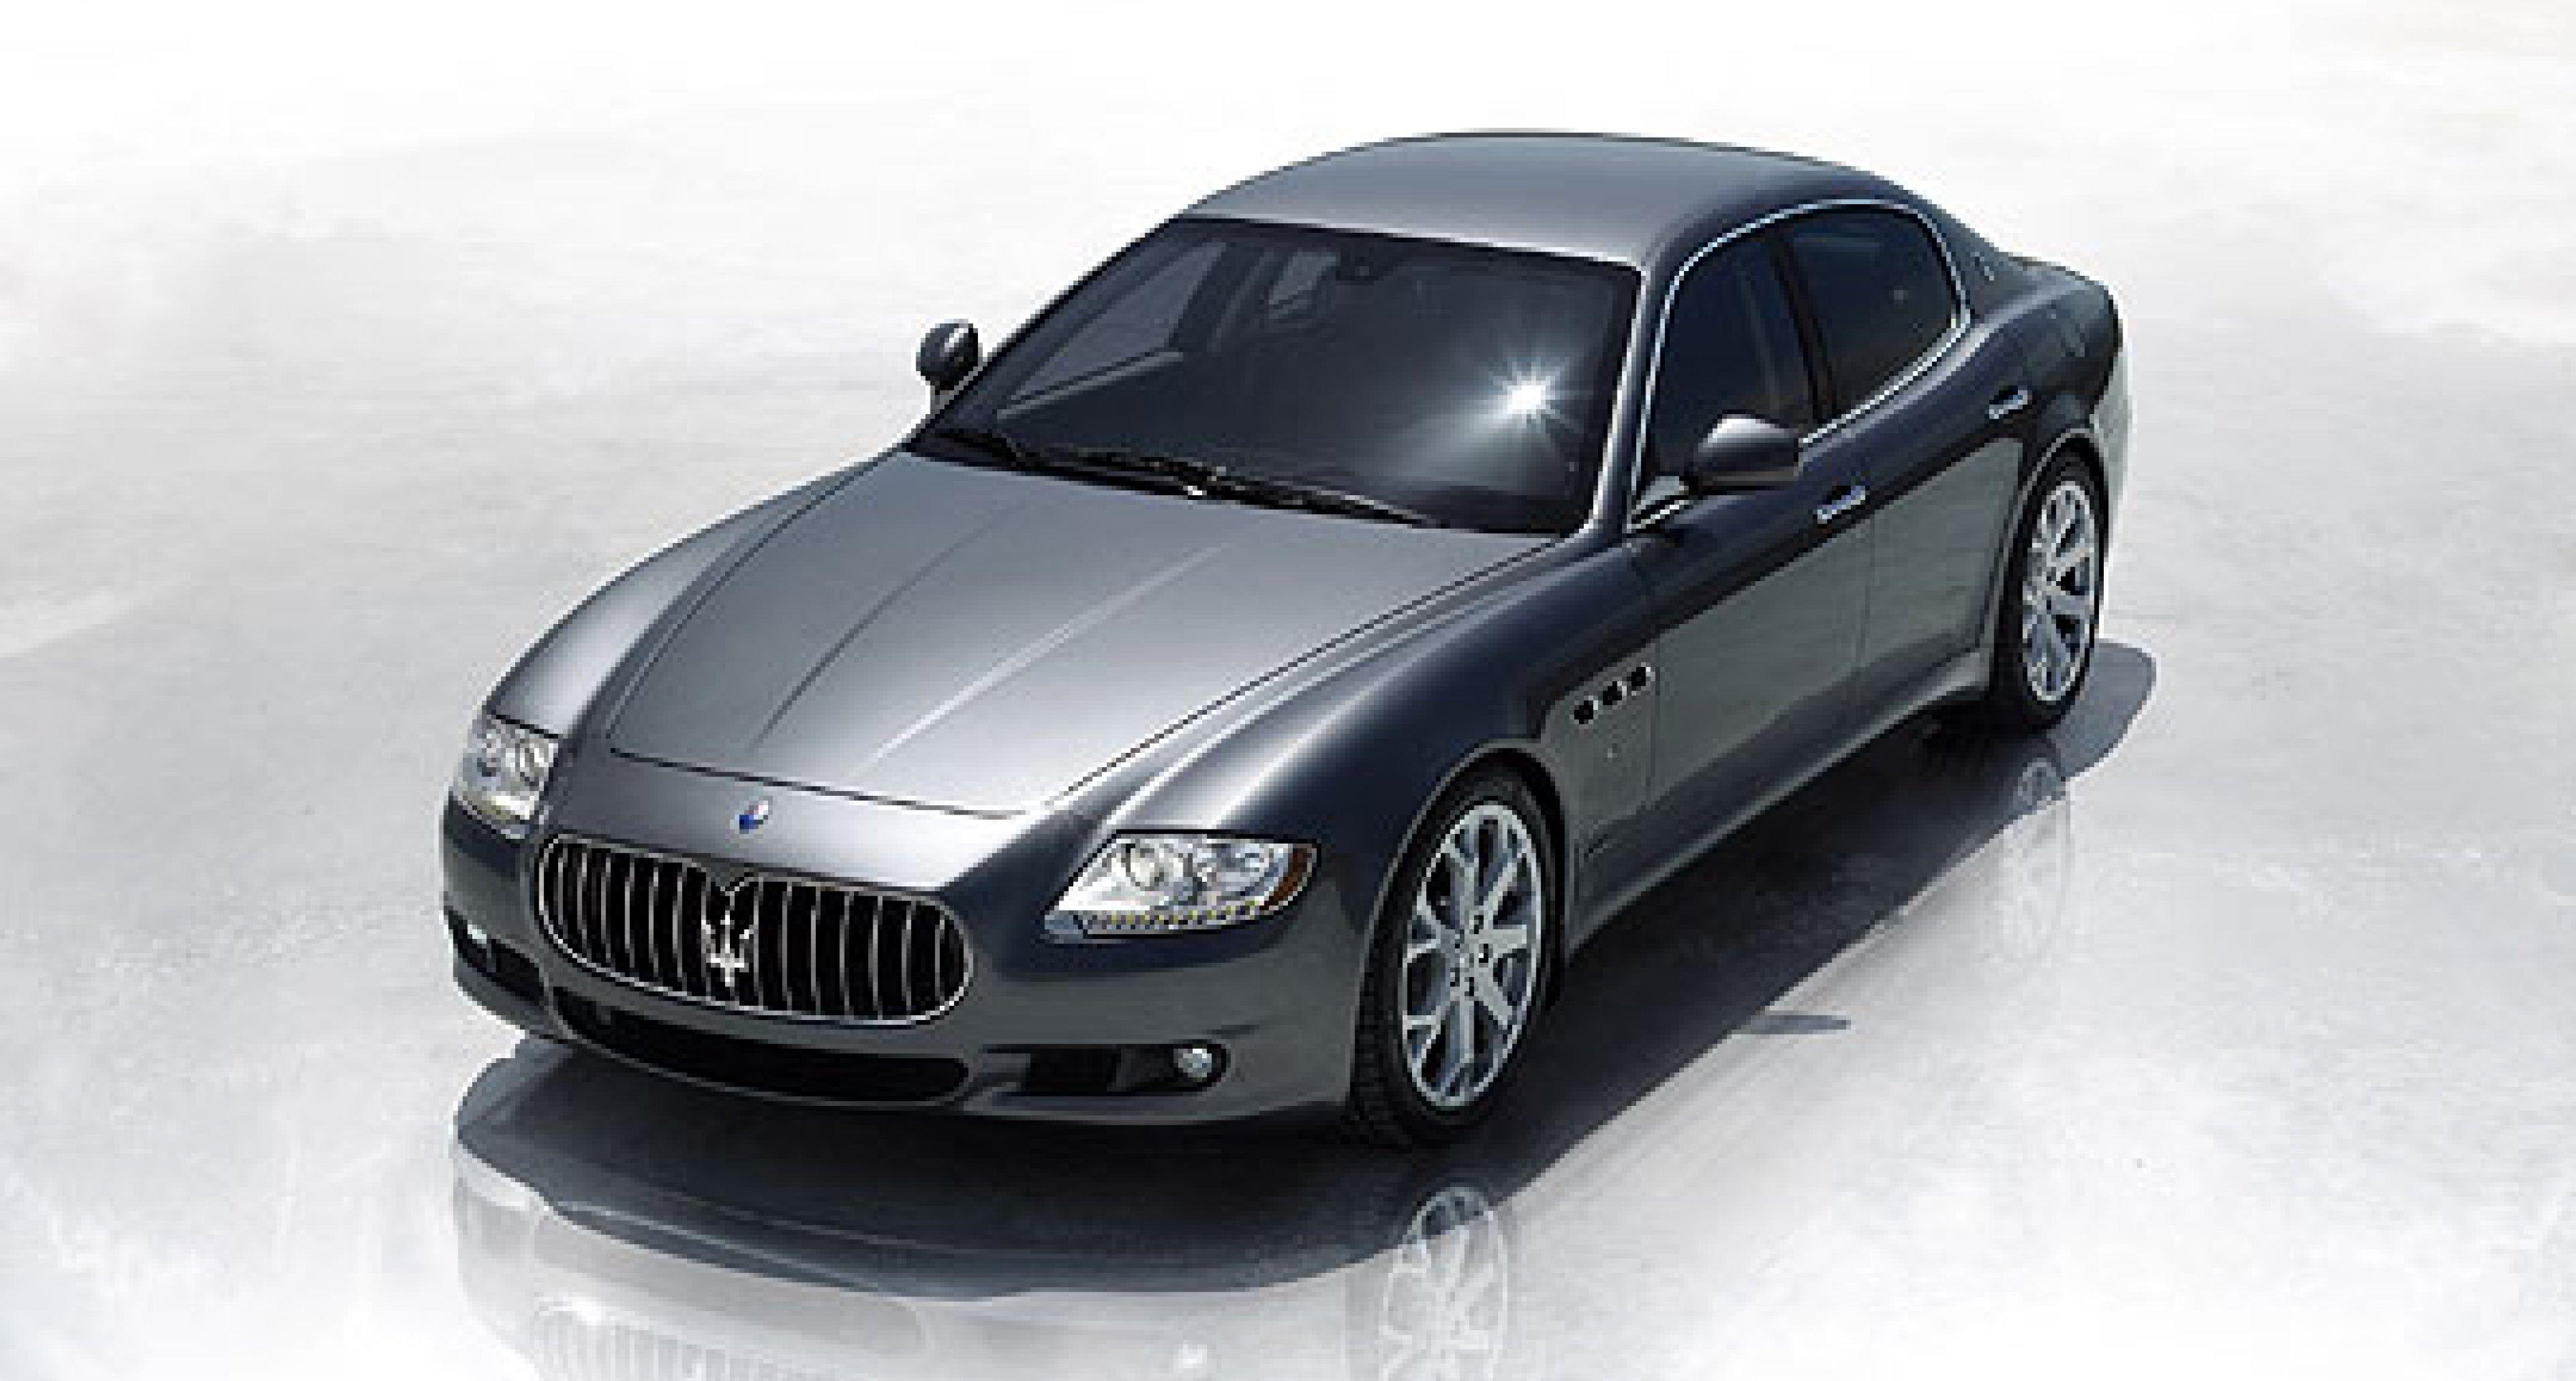 Maserati Updates the Quattroporte